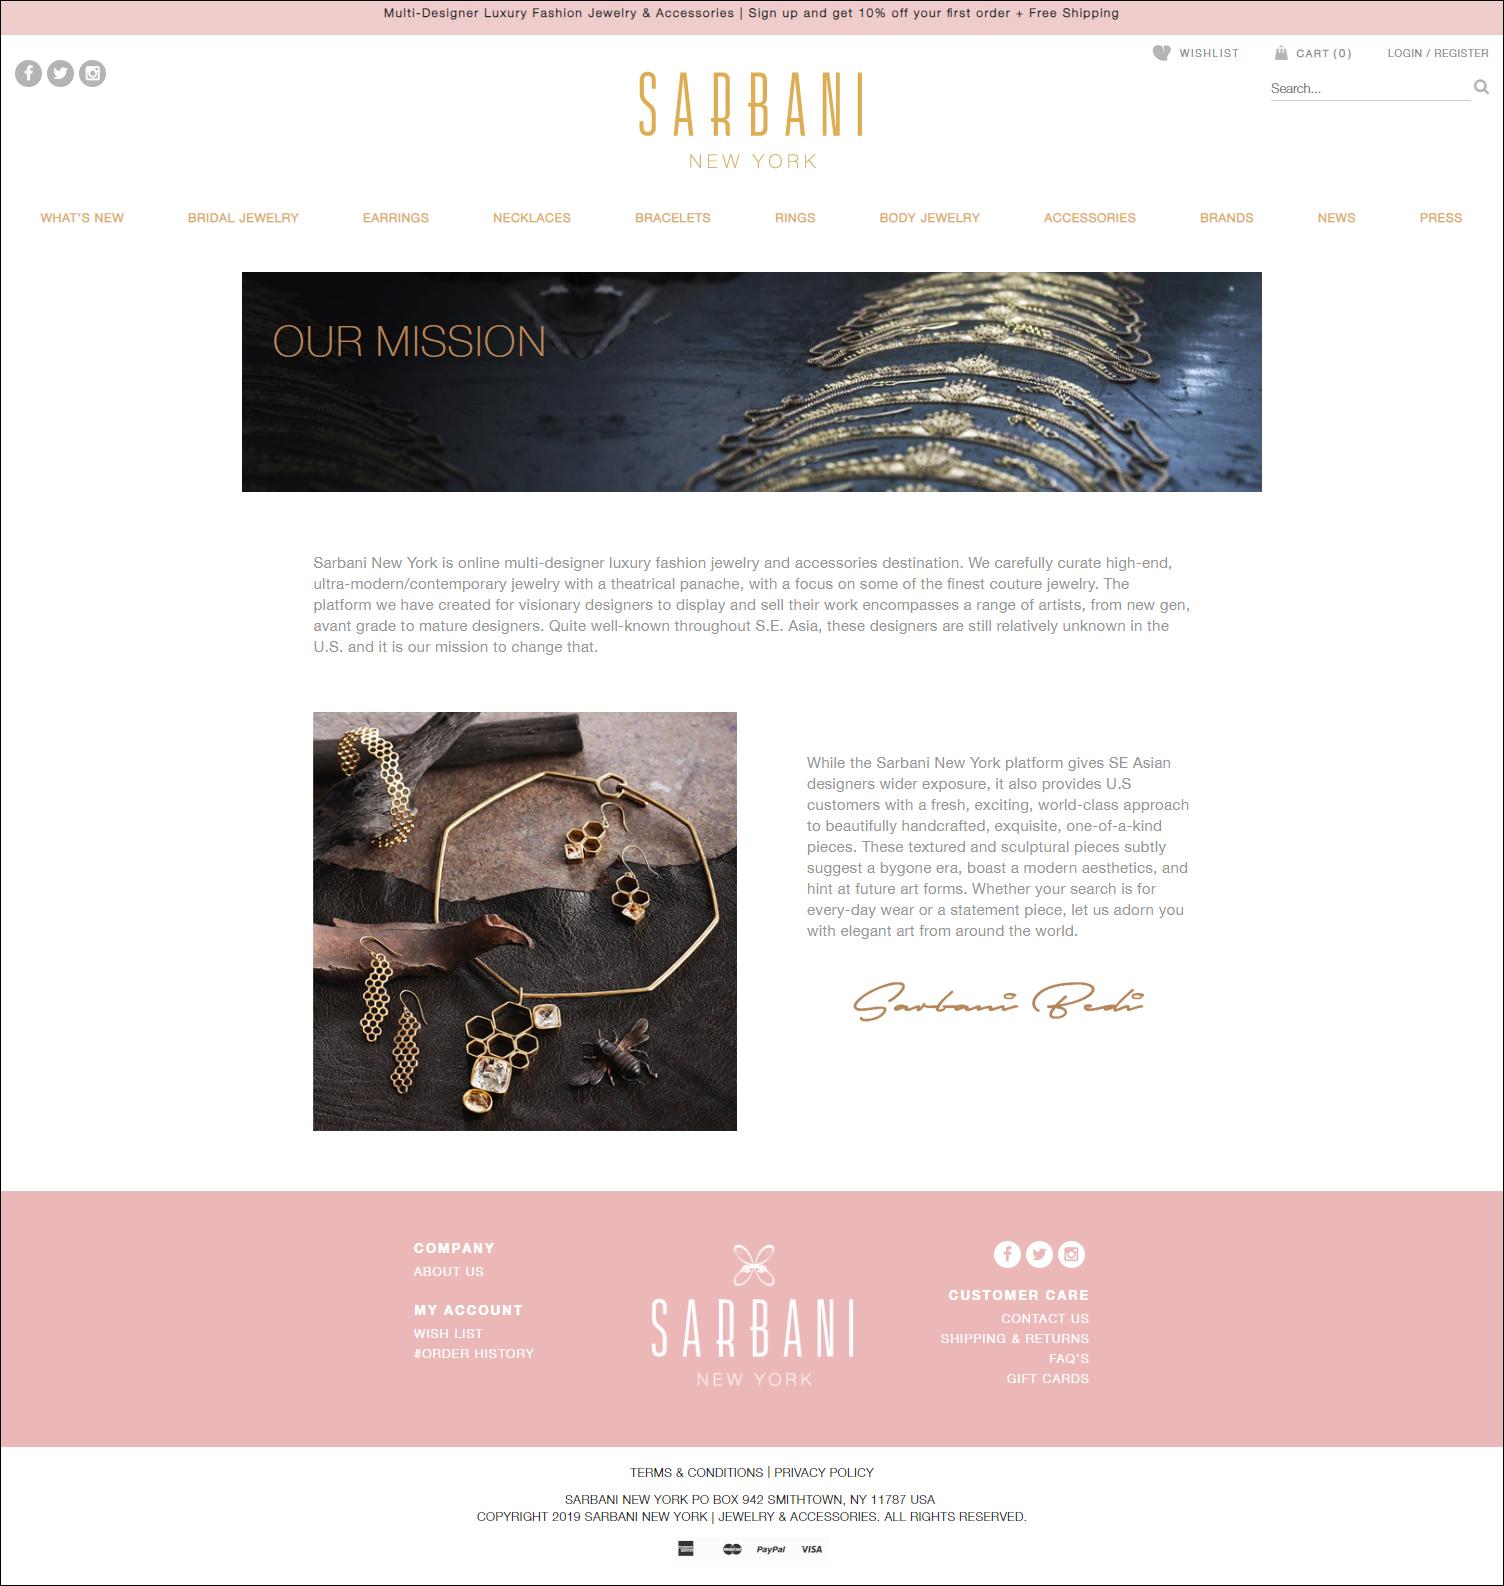 Sarbani-New-York-ABOUT